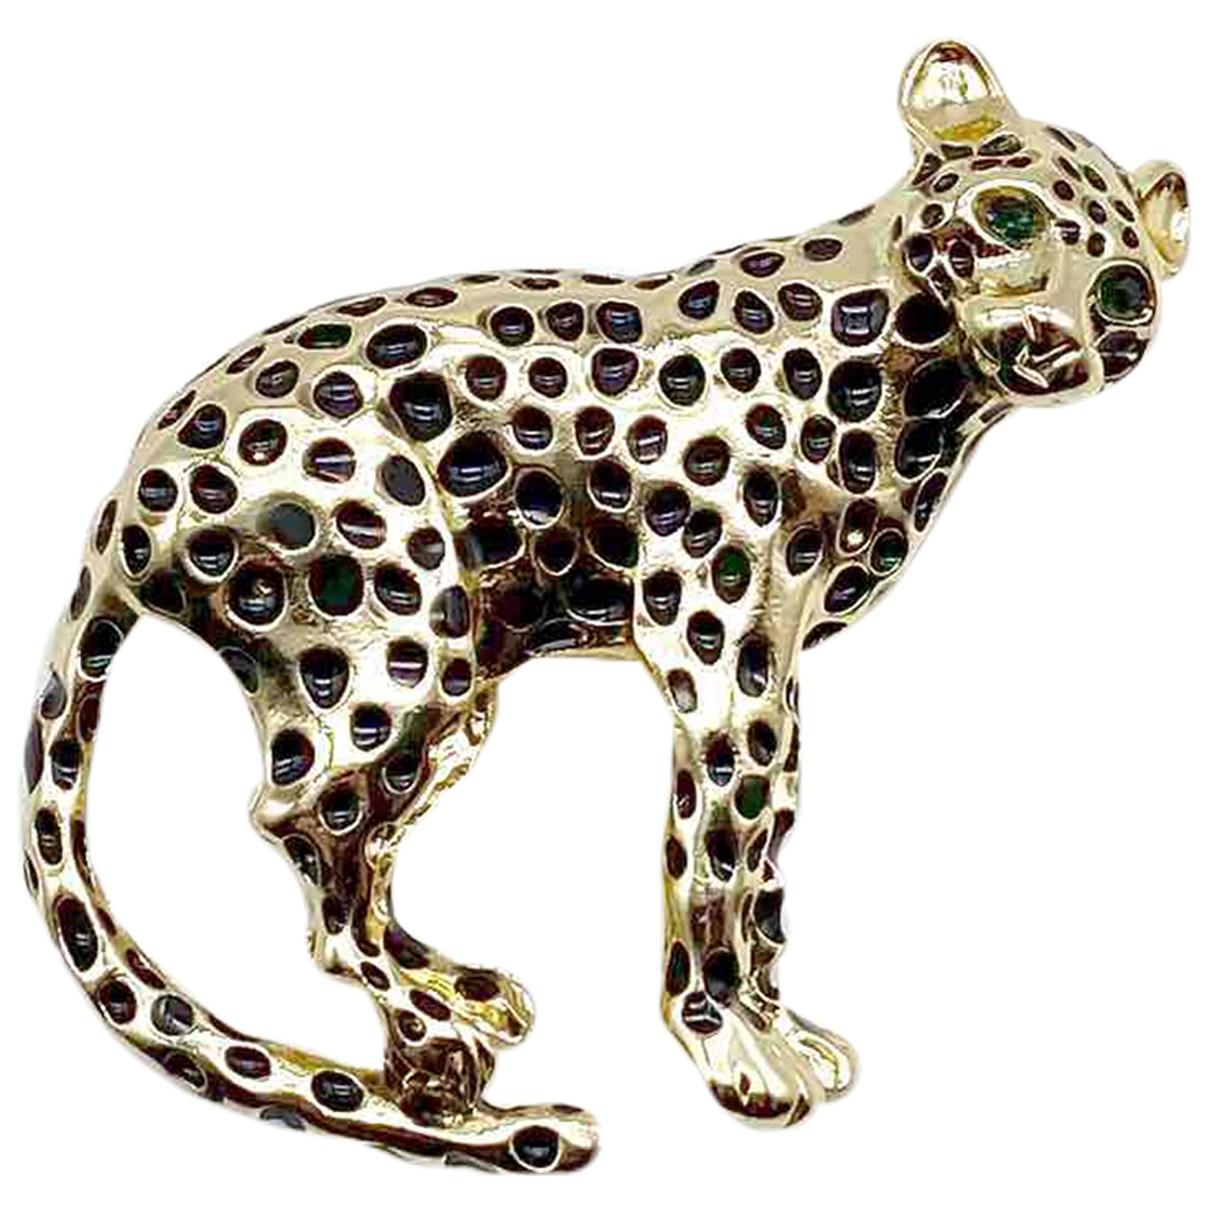 Broche Motifs Animaliers en Metal Dorado Non Signe / Unsigned